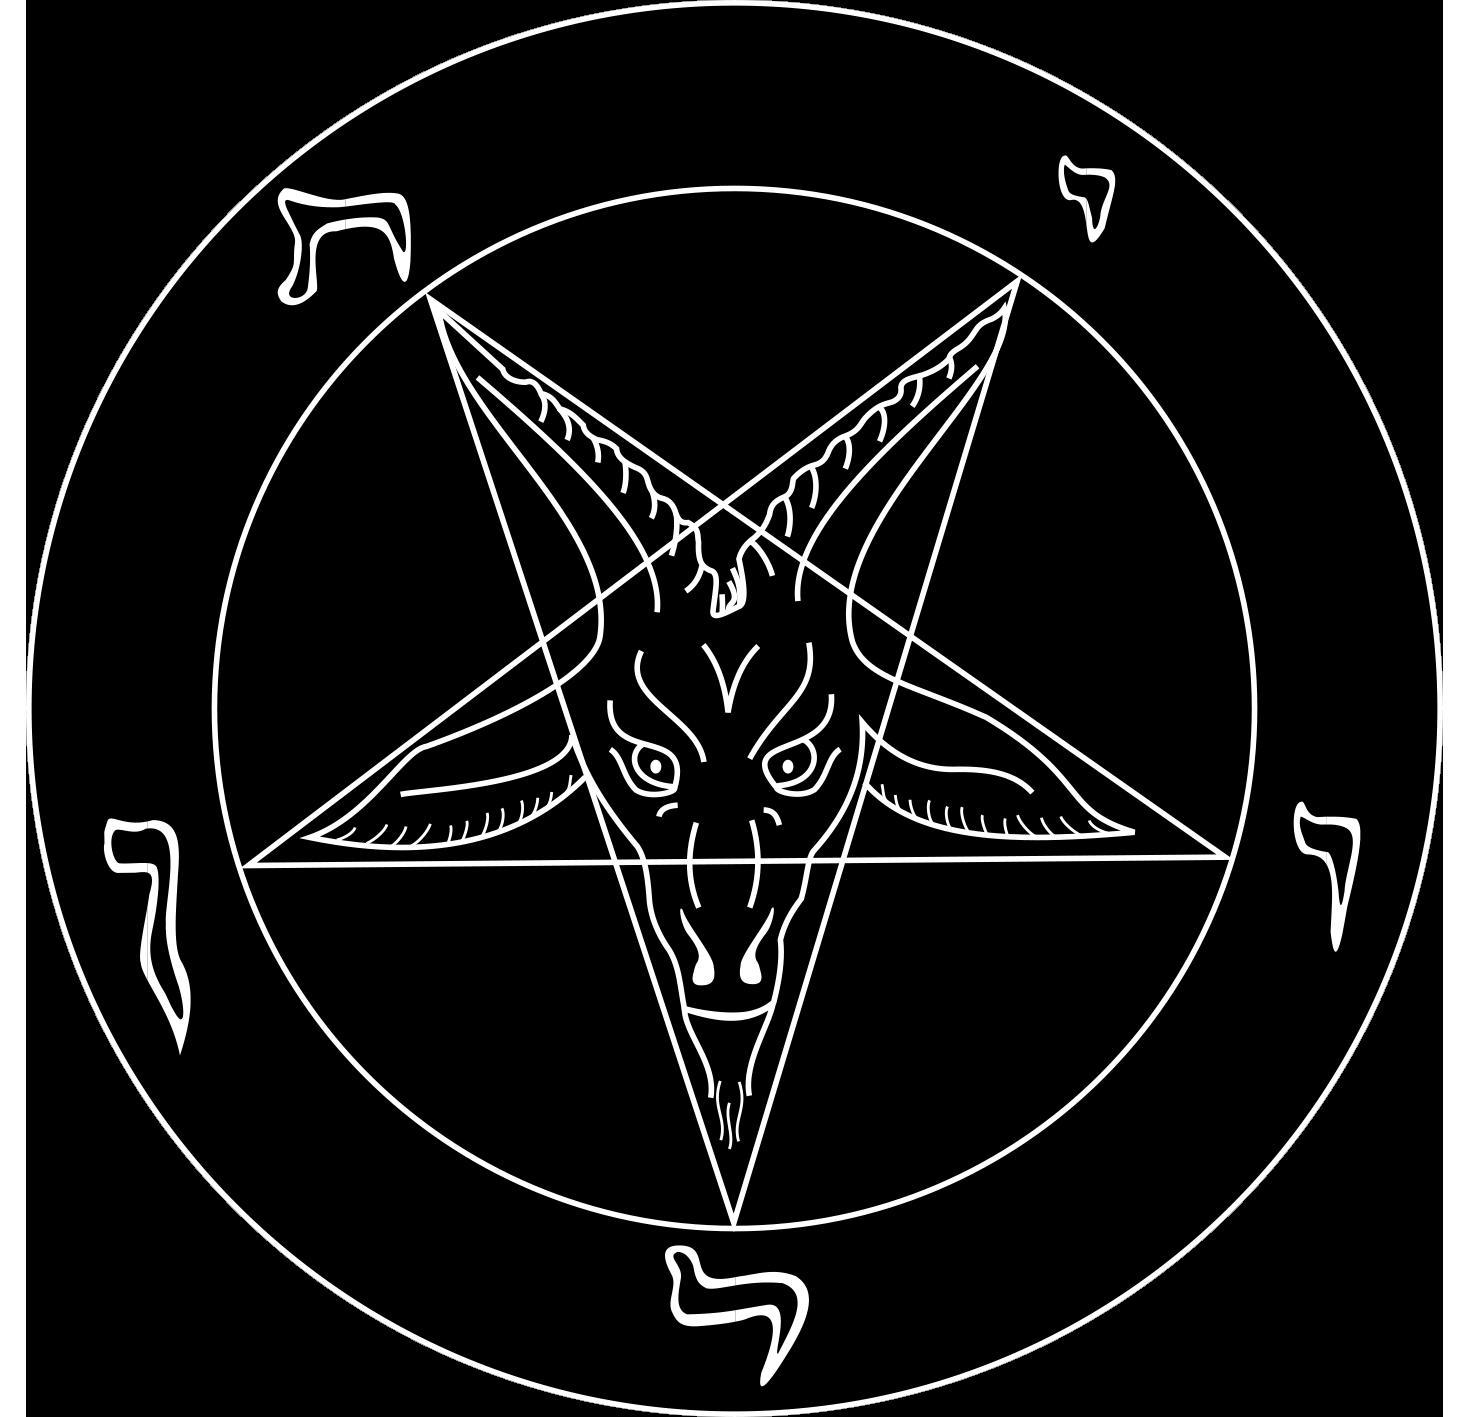 شیطانگرایی لاویایی